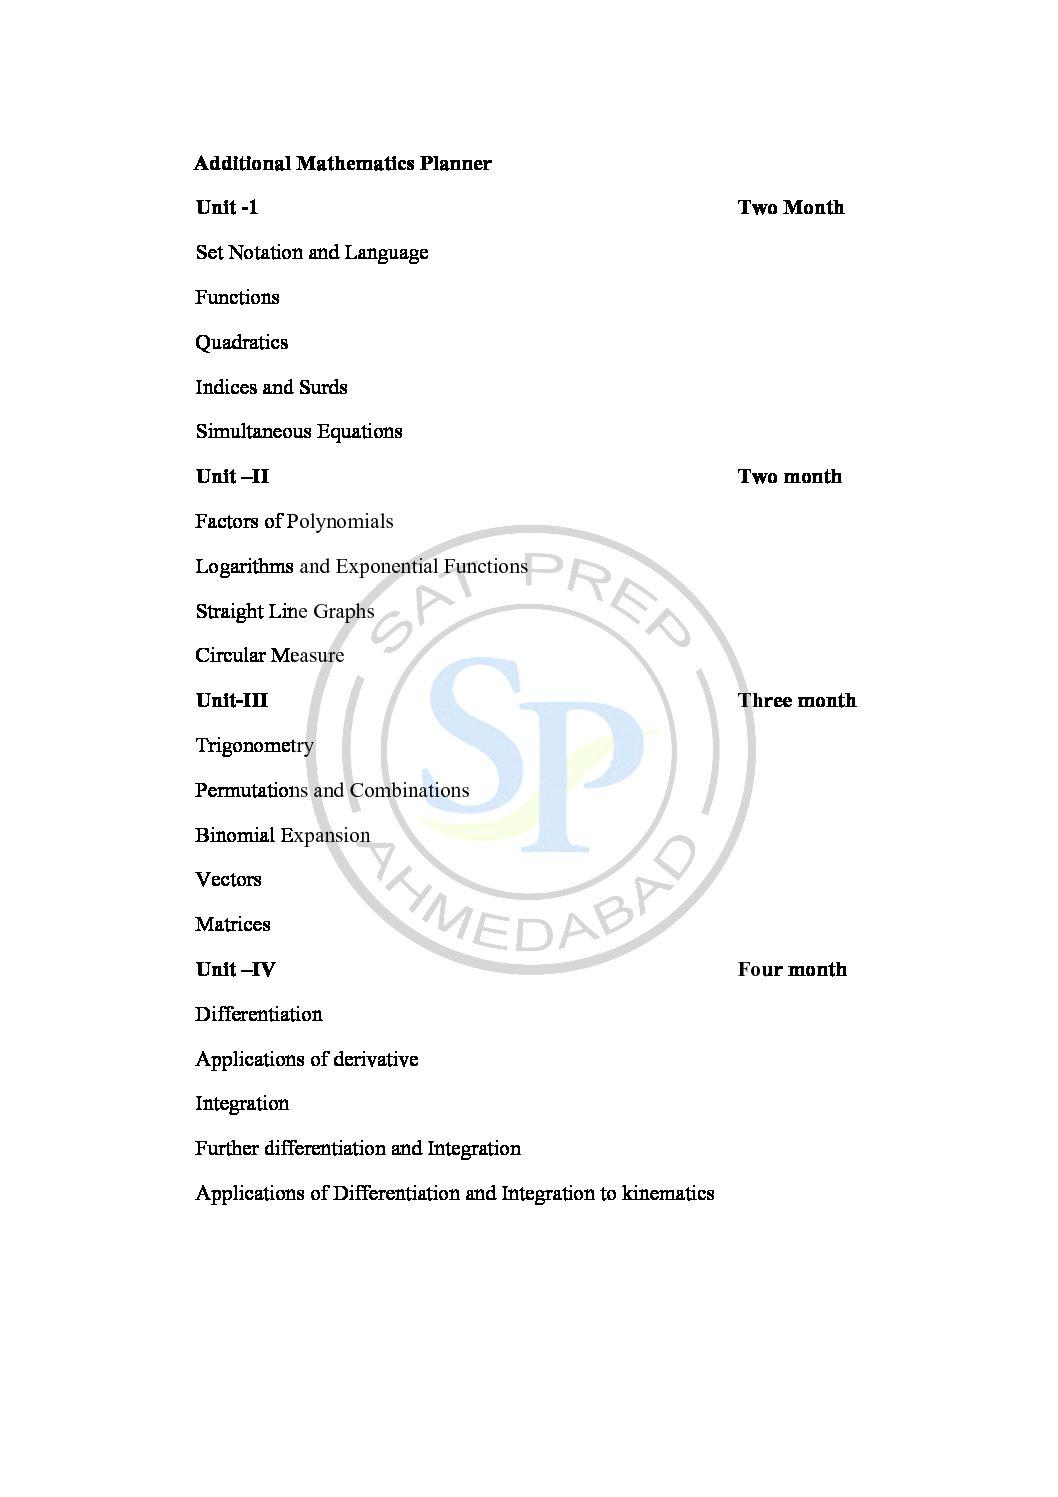 Additional math Planner Archives - SAT PREP